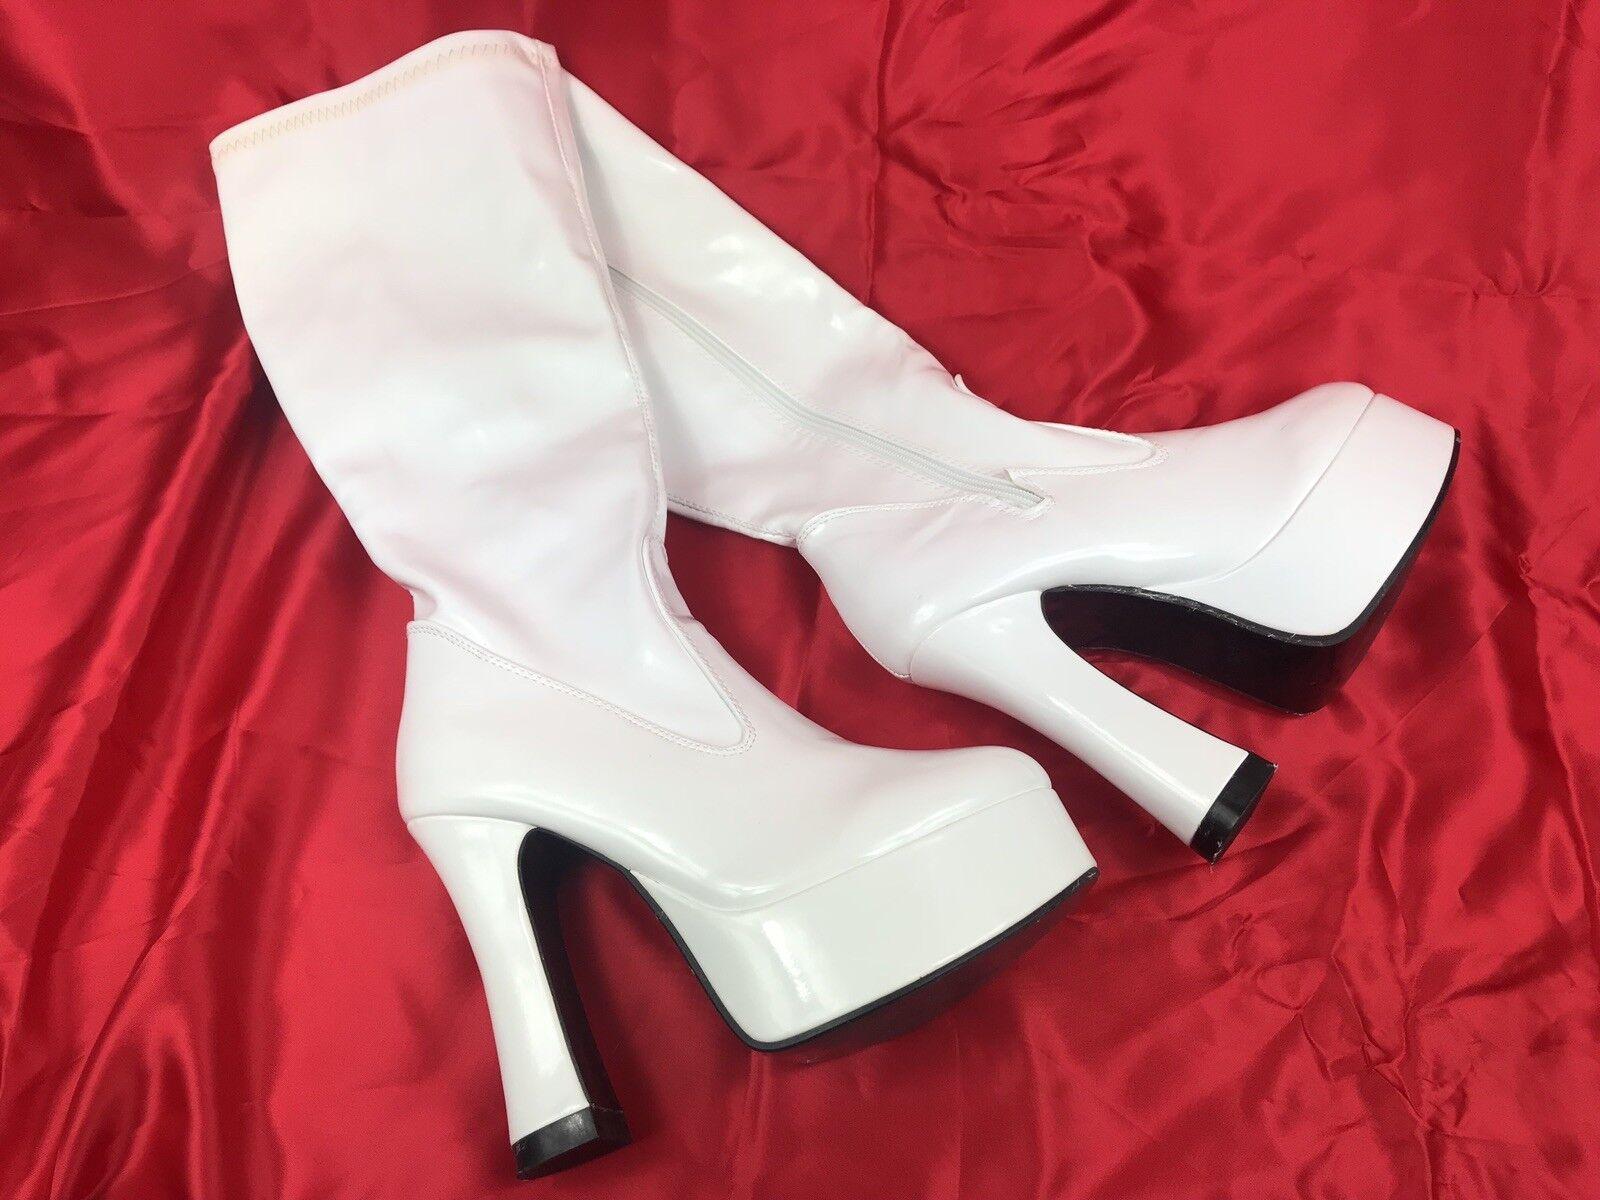 Womens Latex Knee High White Boots Strip EUR 38 UK 6